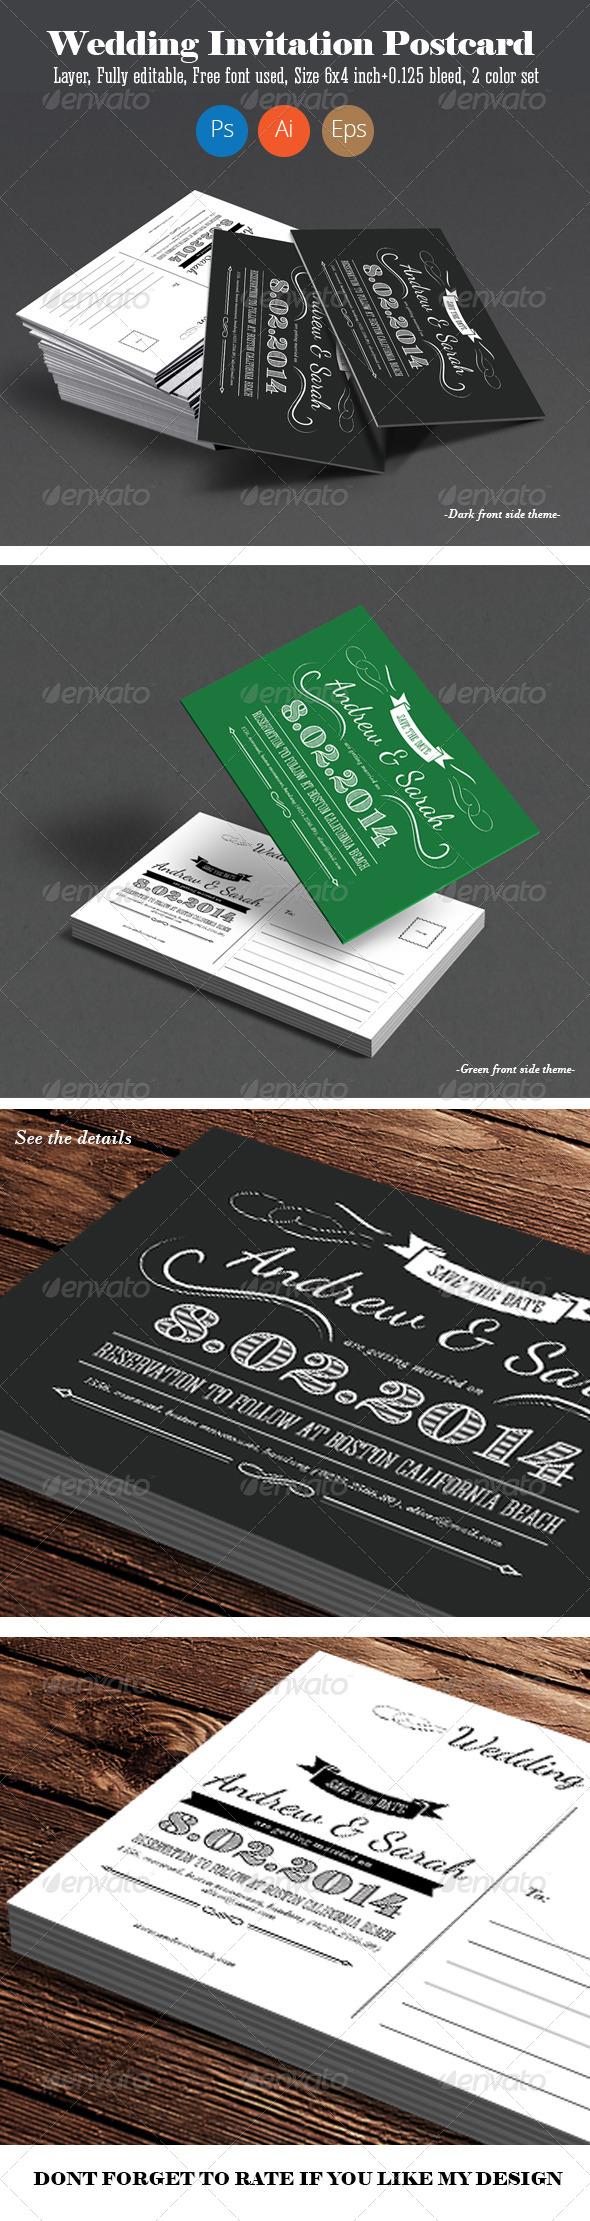 GraphicRiver Vintage Wedding Invitation Post Card 7865324